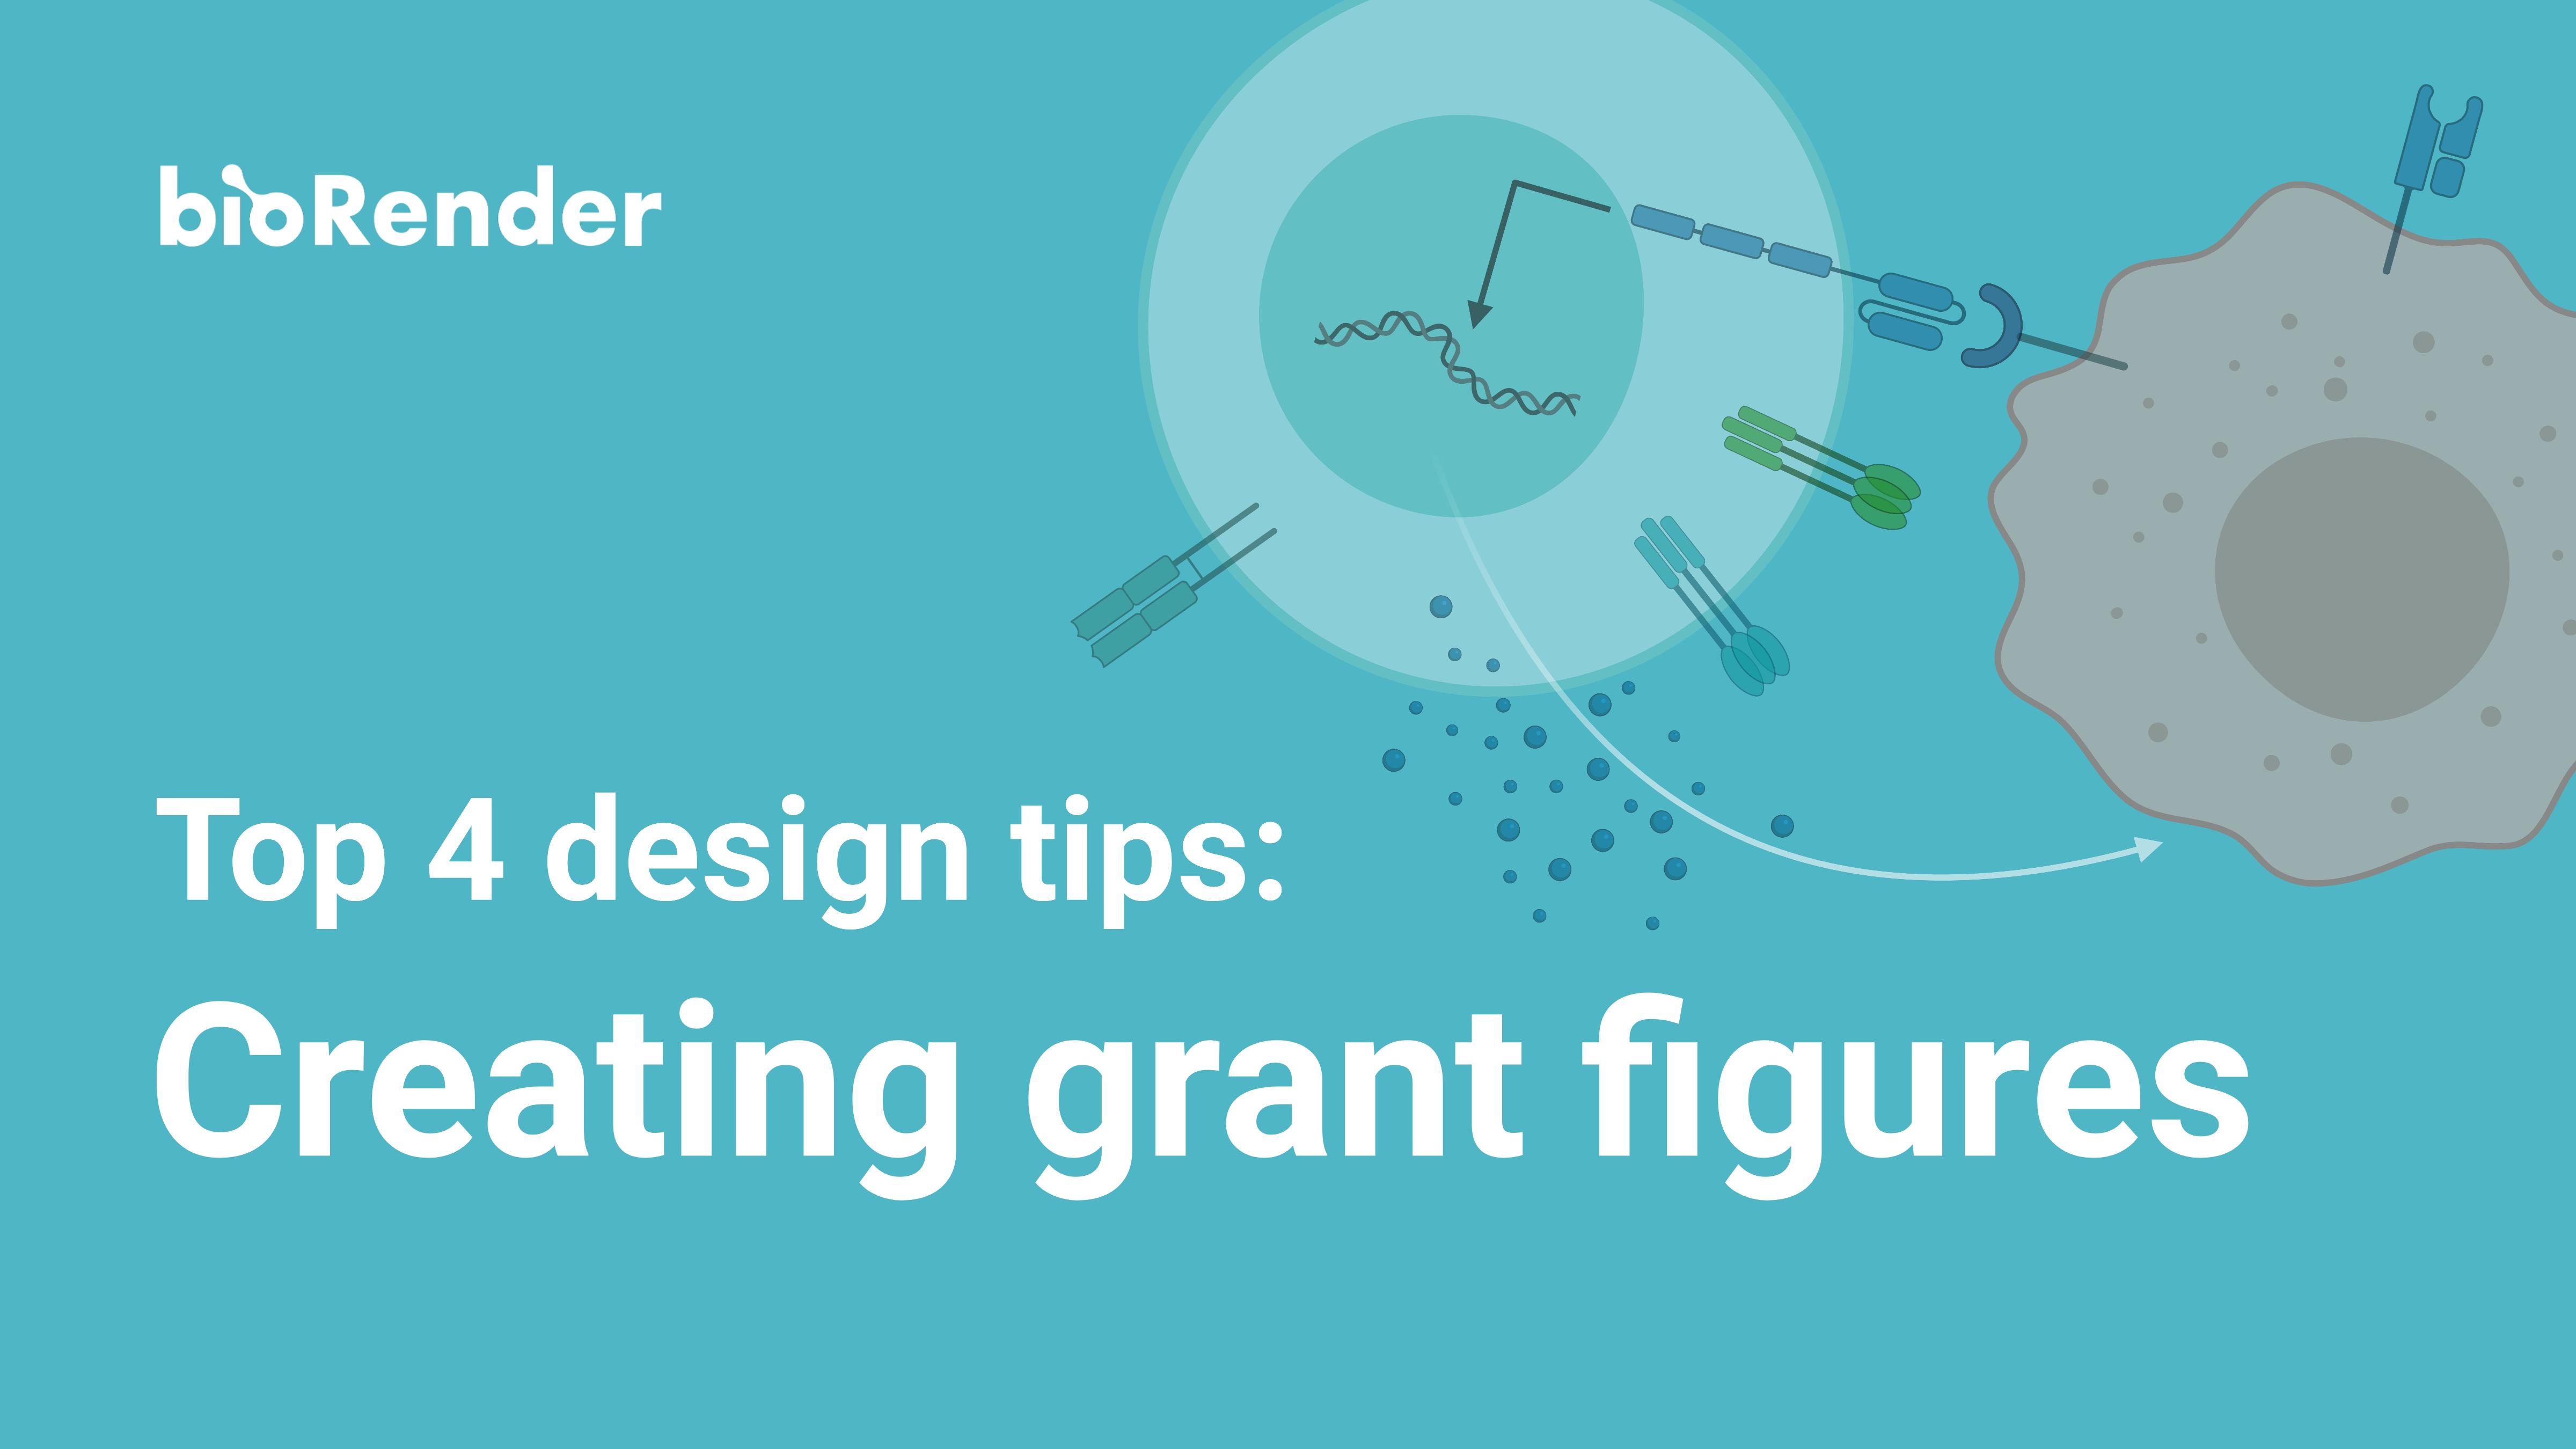 Creating grant figures